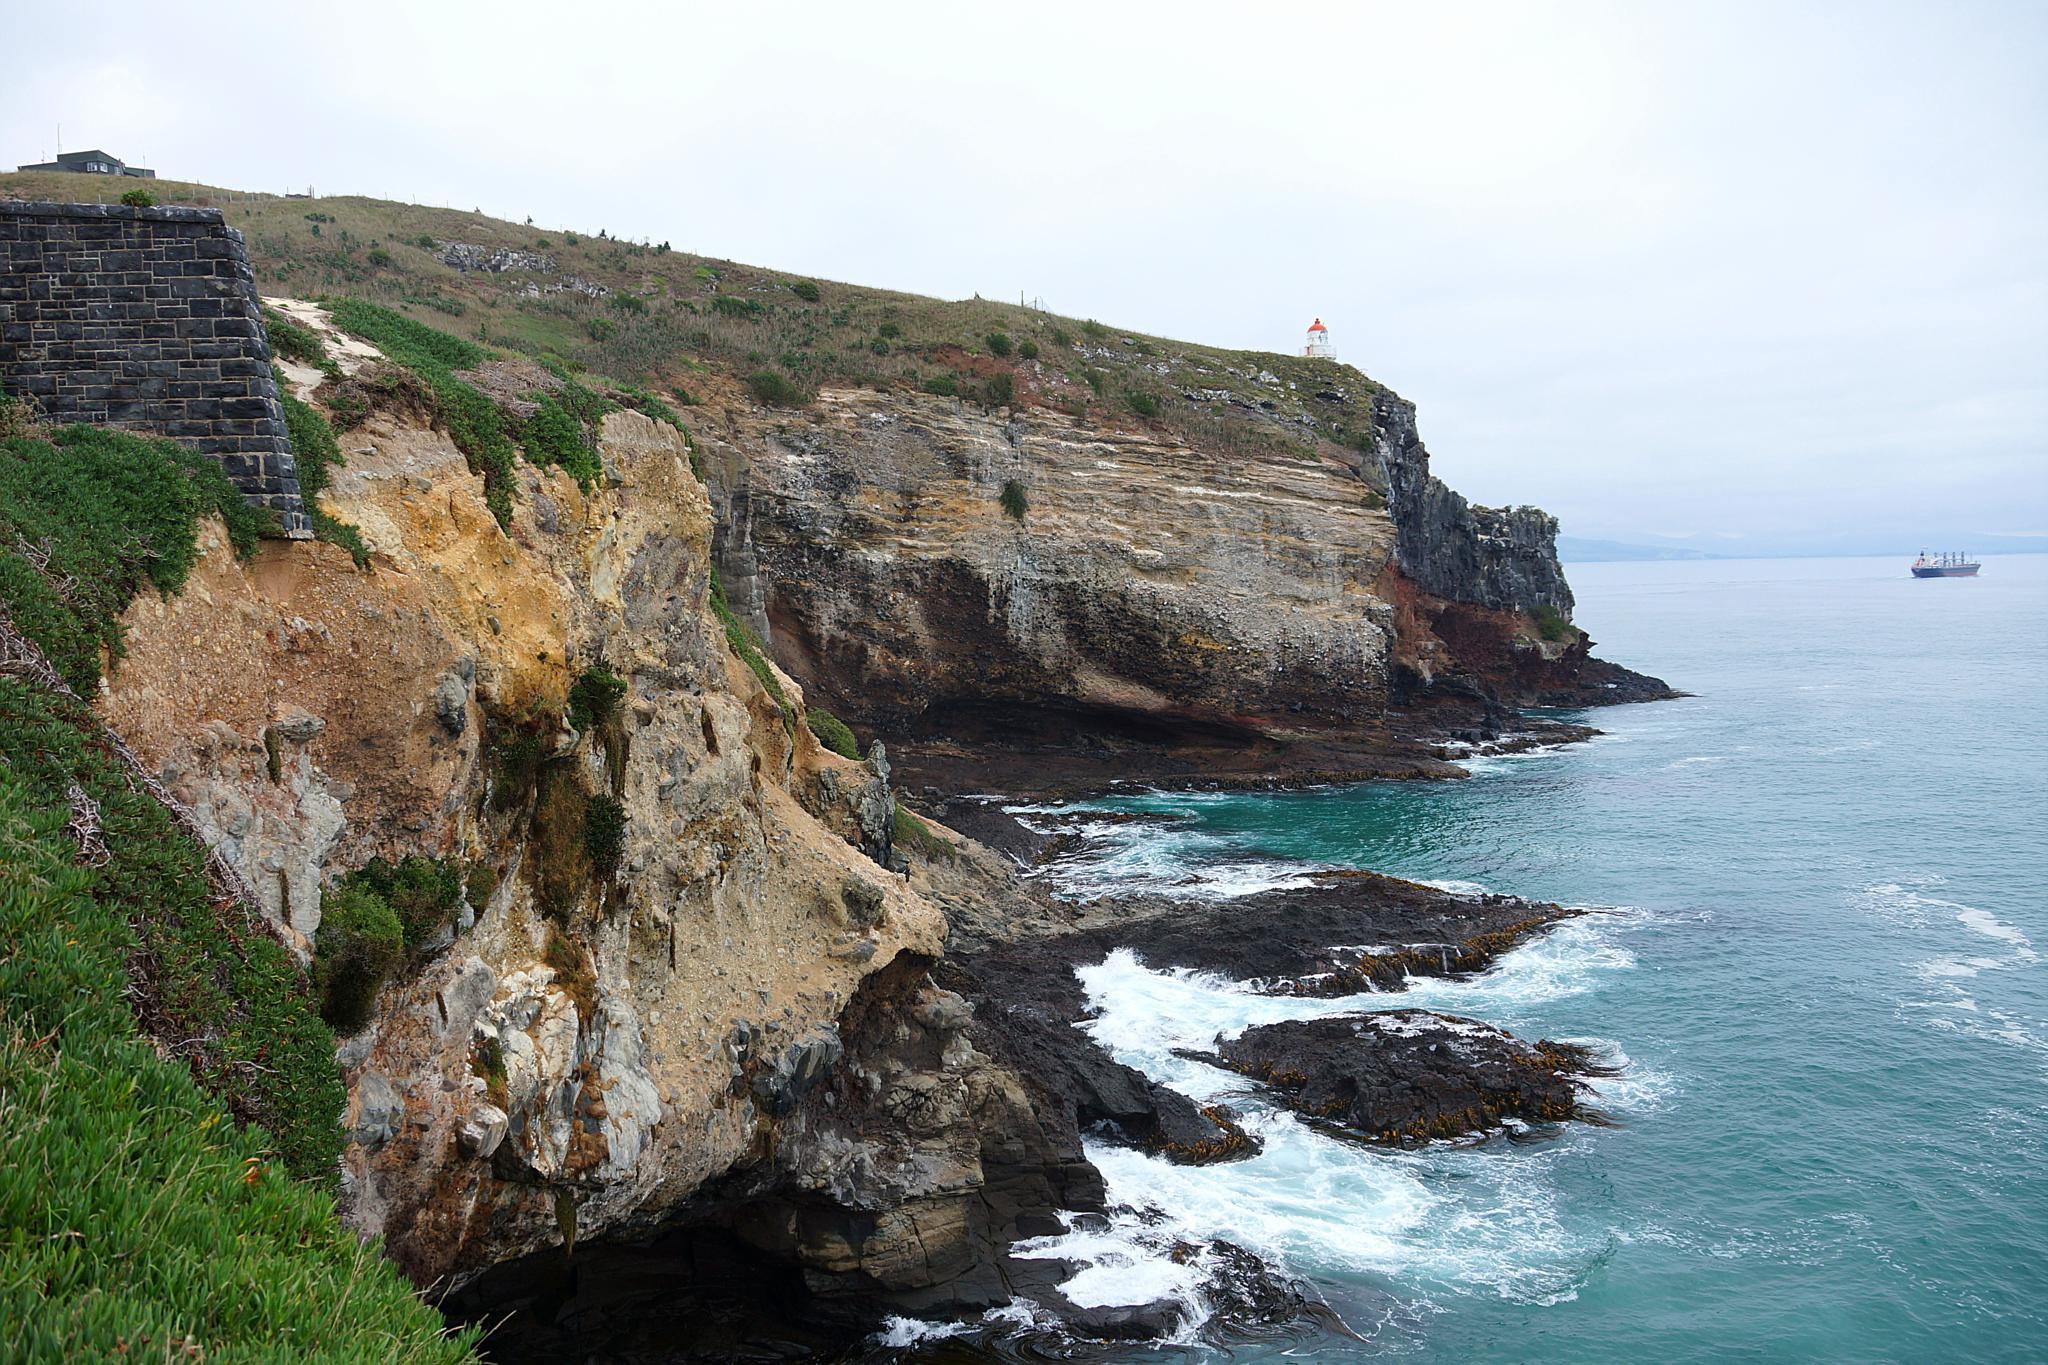 Rugged Coastline by Peter J Dwight